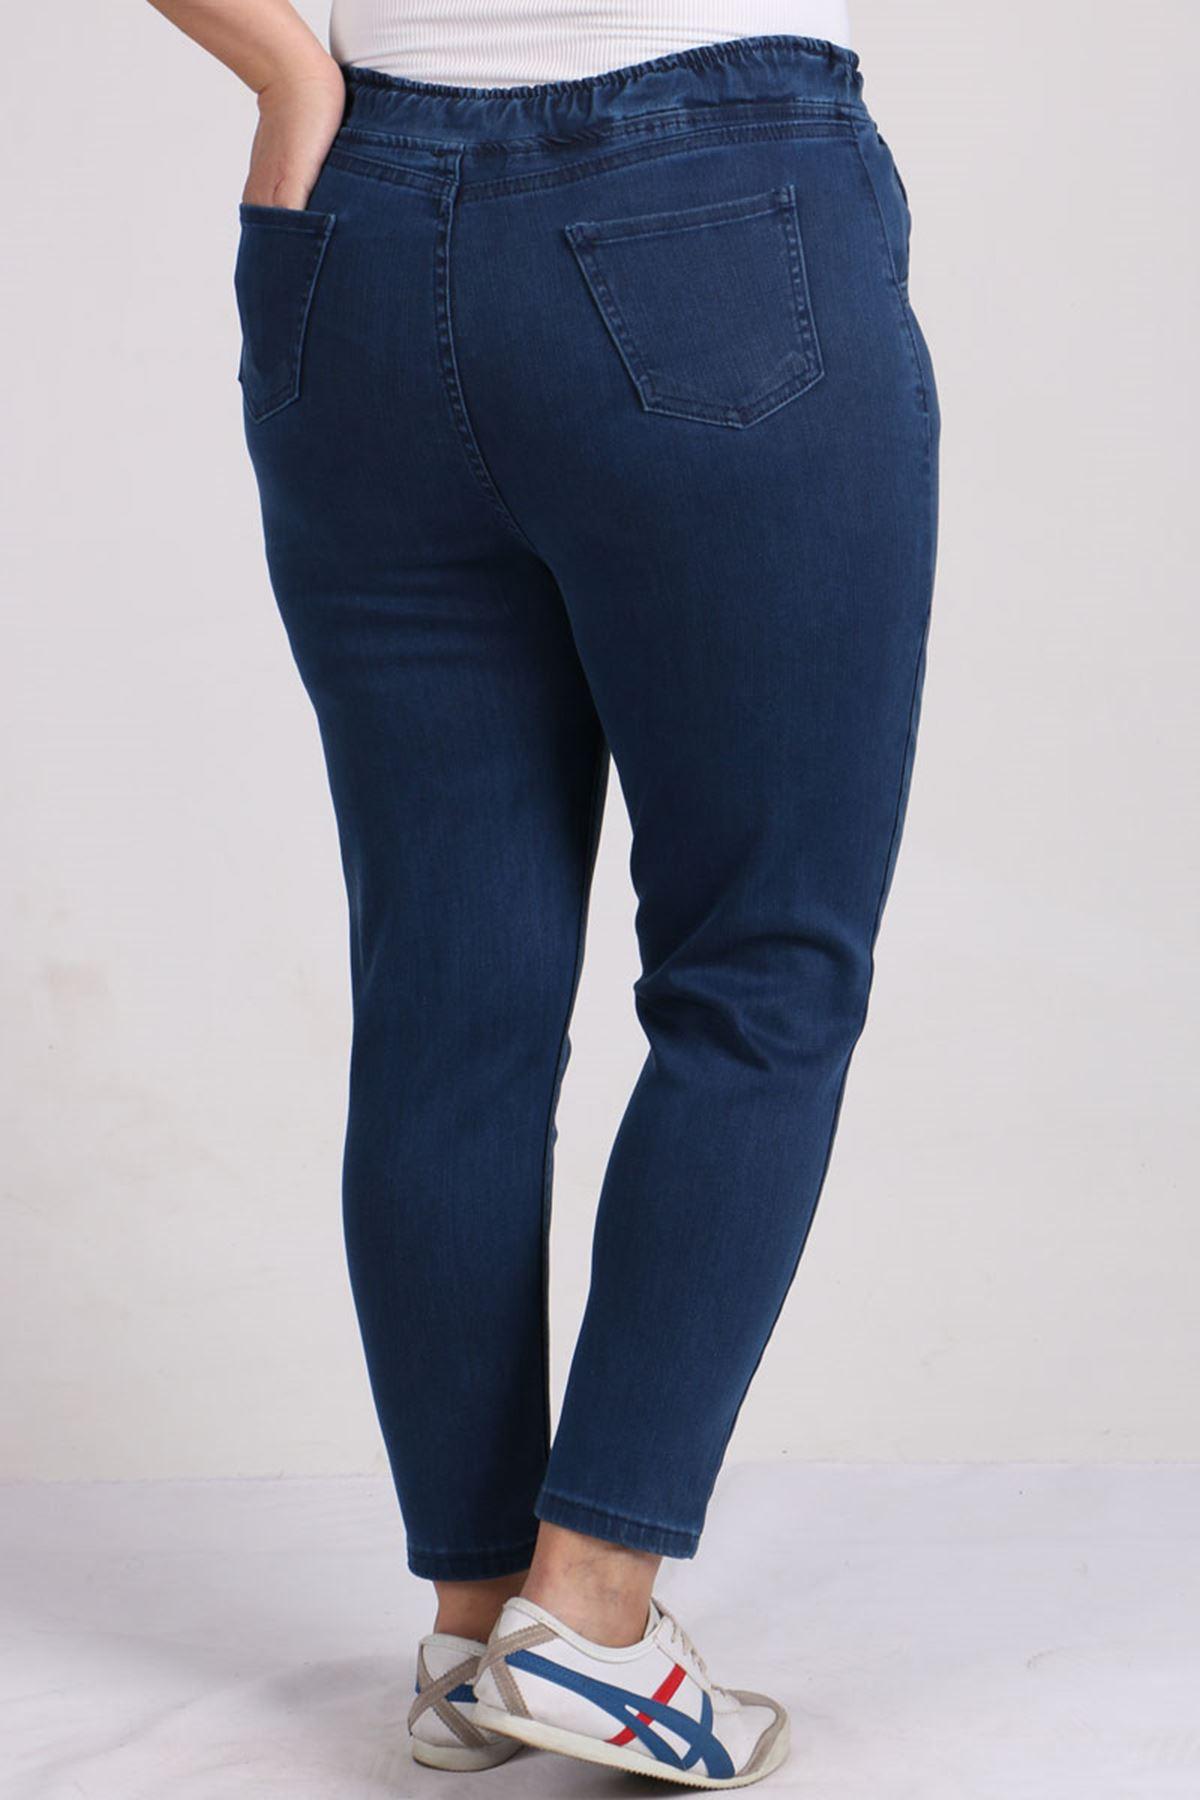 9136 Büyük Beden Beli Lastikli Mom Jeans Pantolon Koyu Mavi - Saks